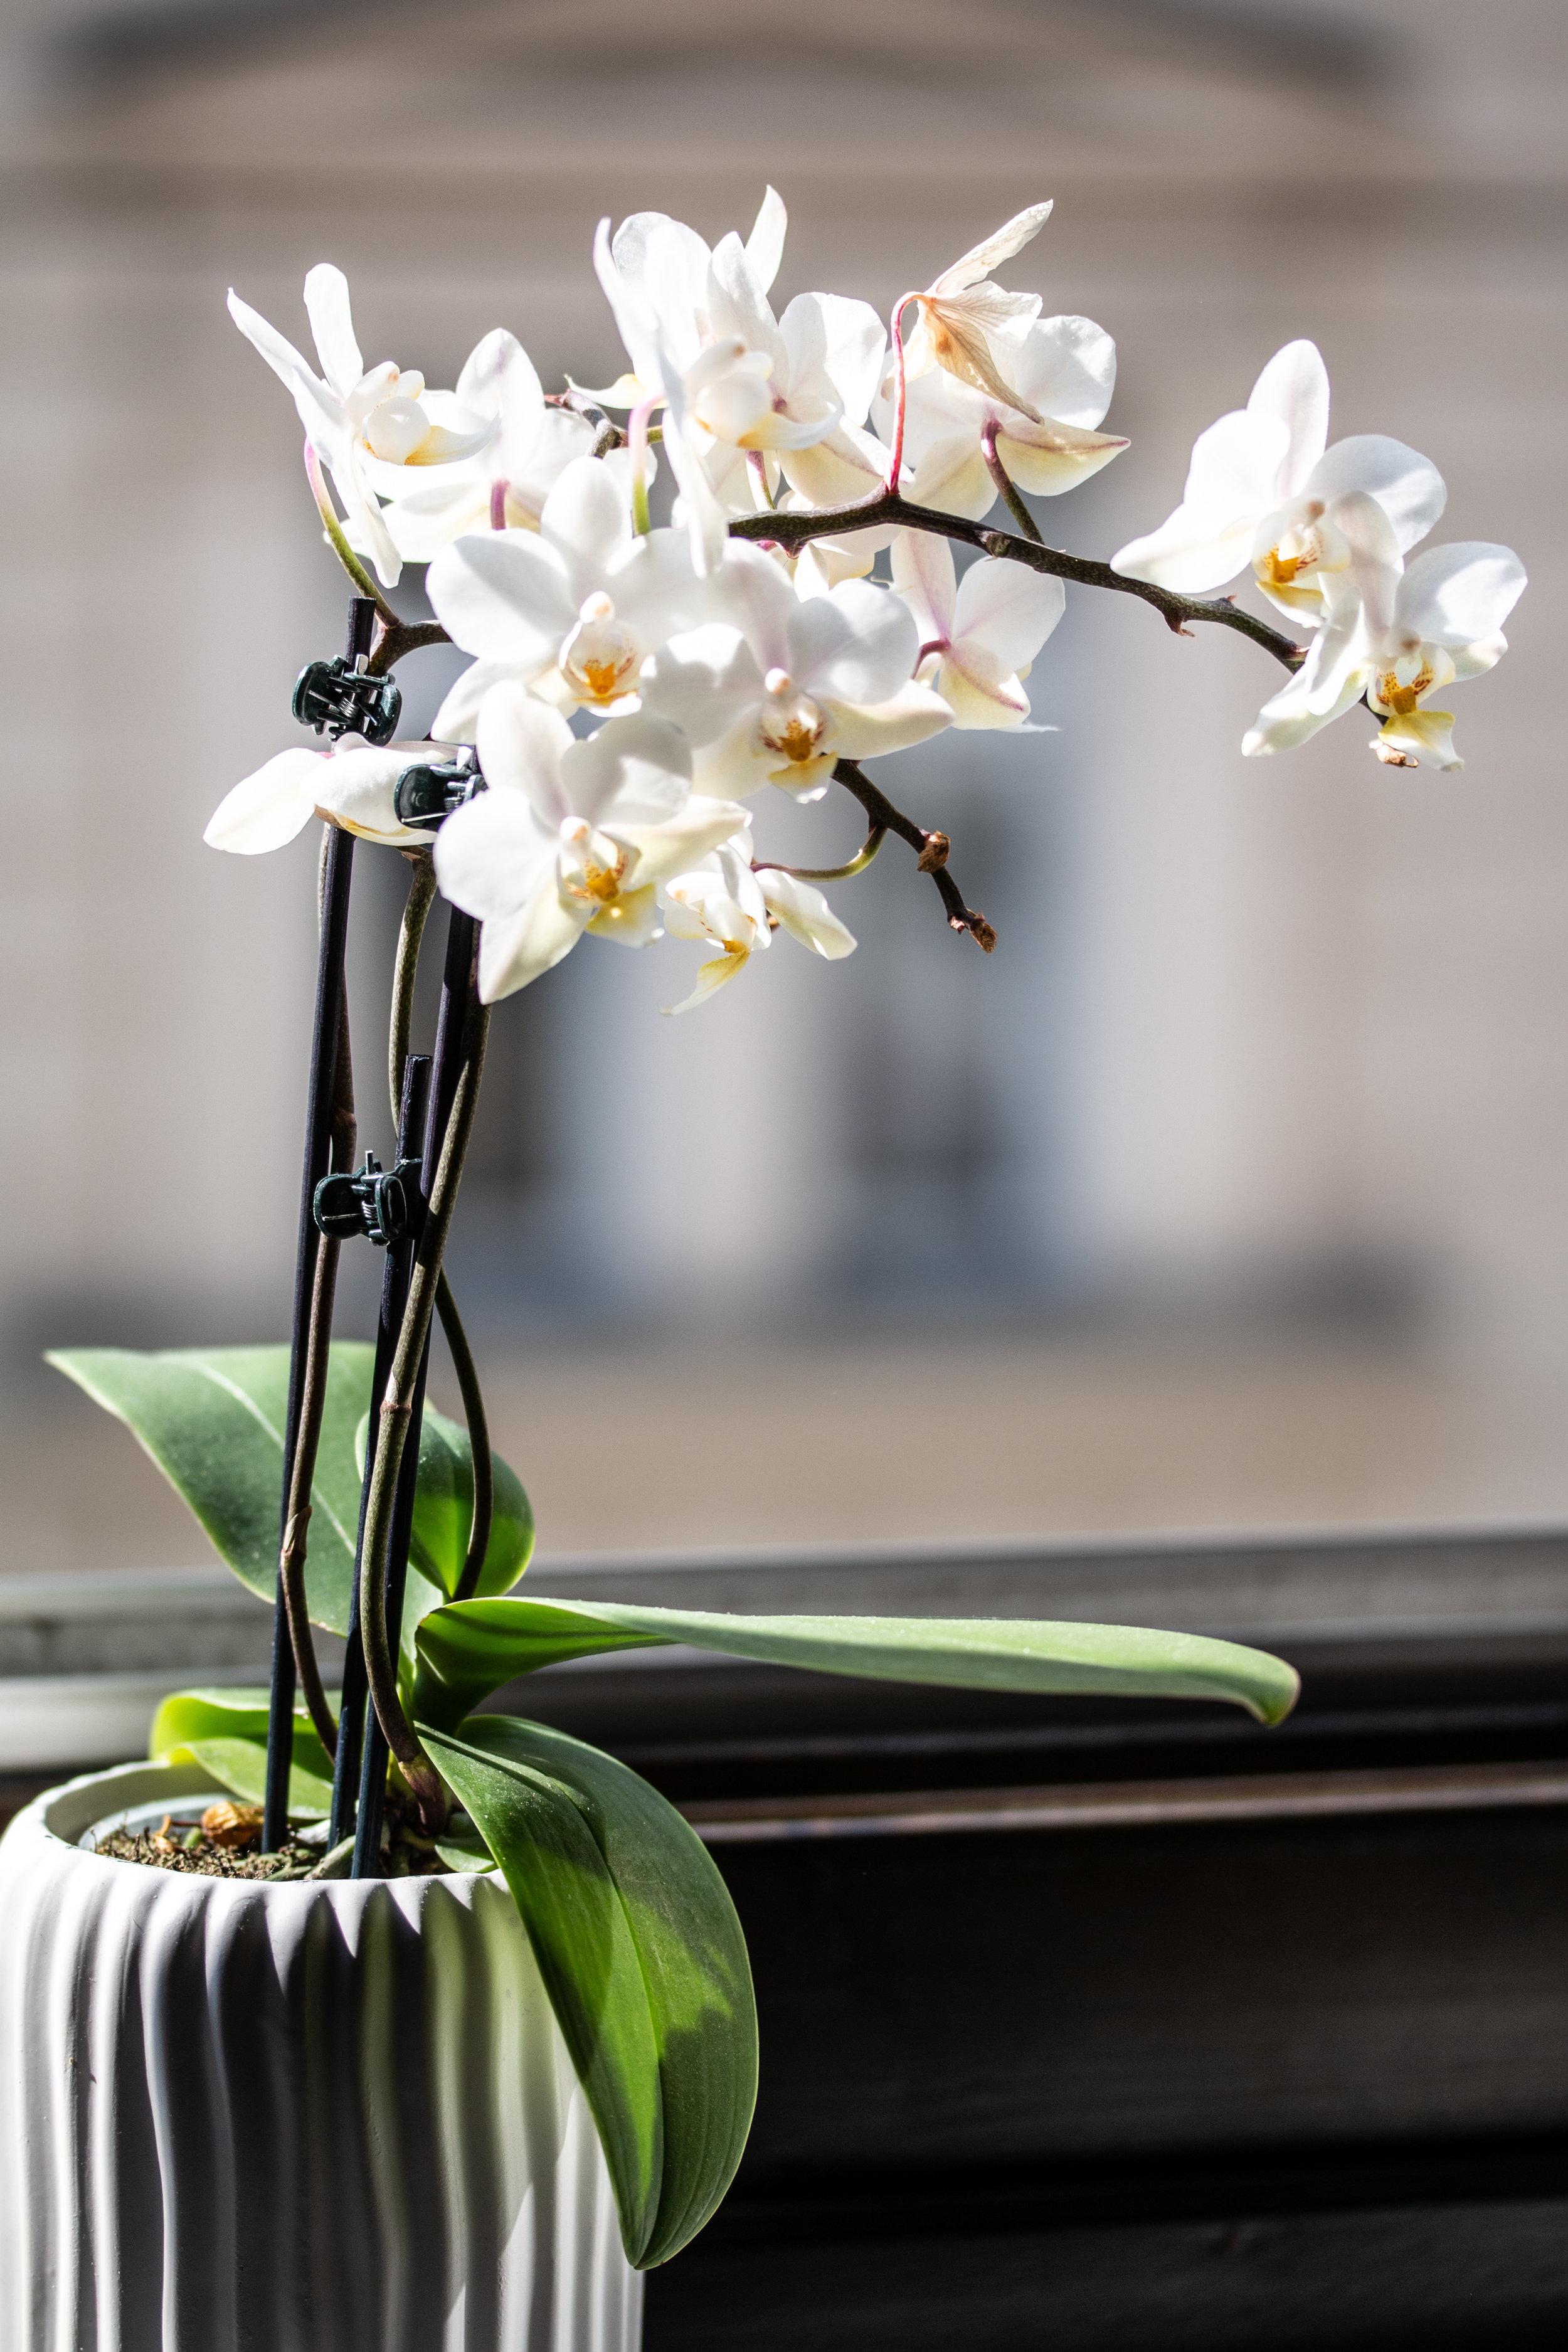 20180528_0001_Orchidee.jpg